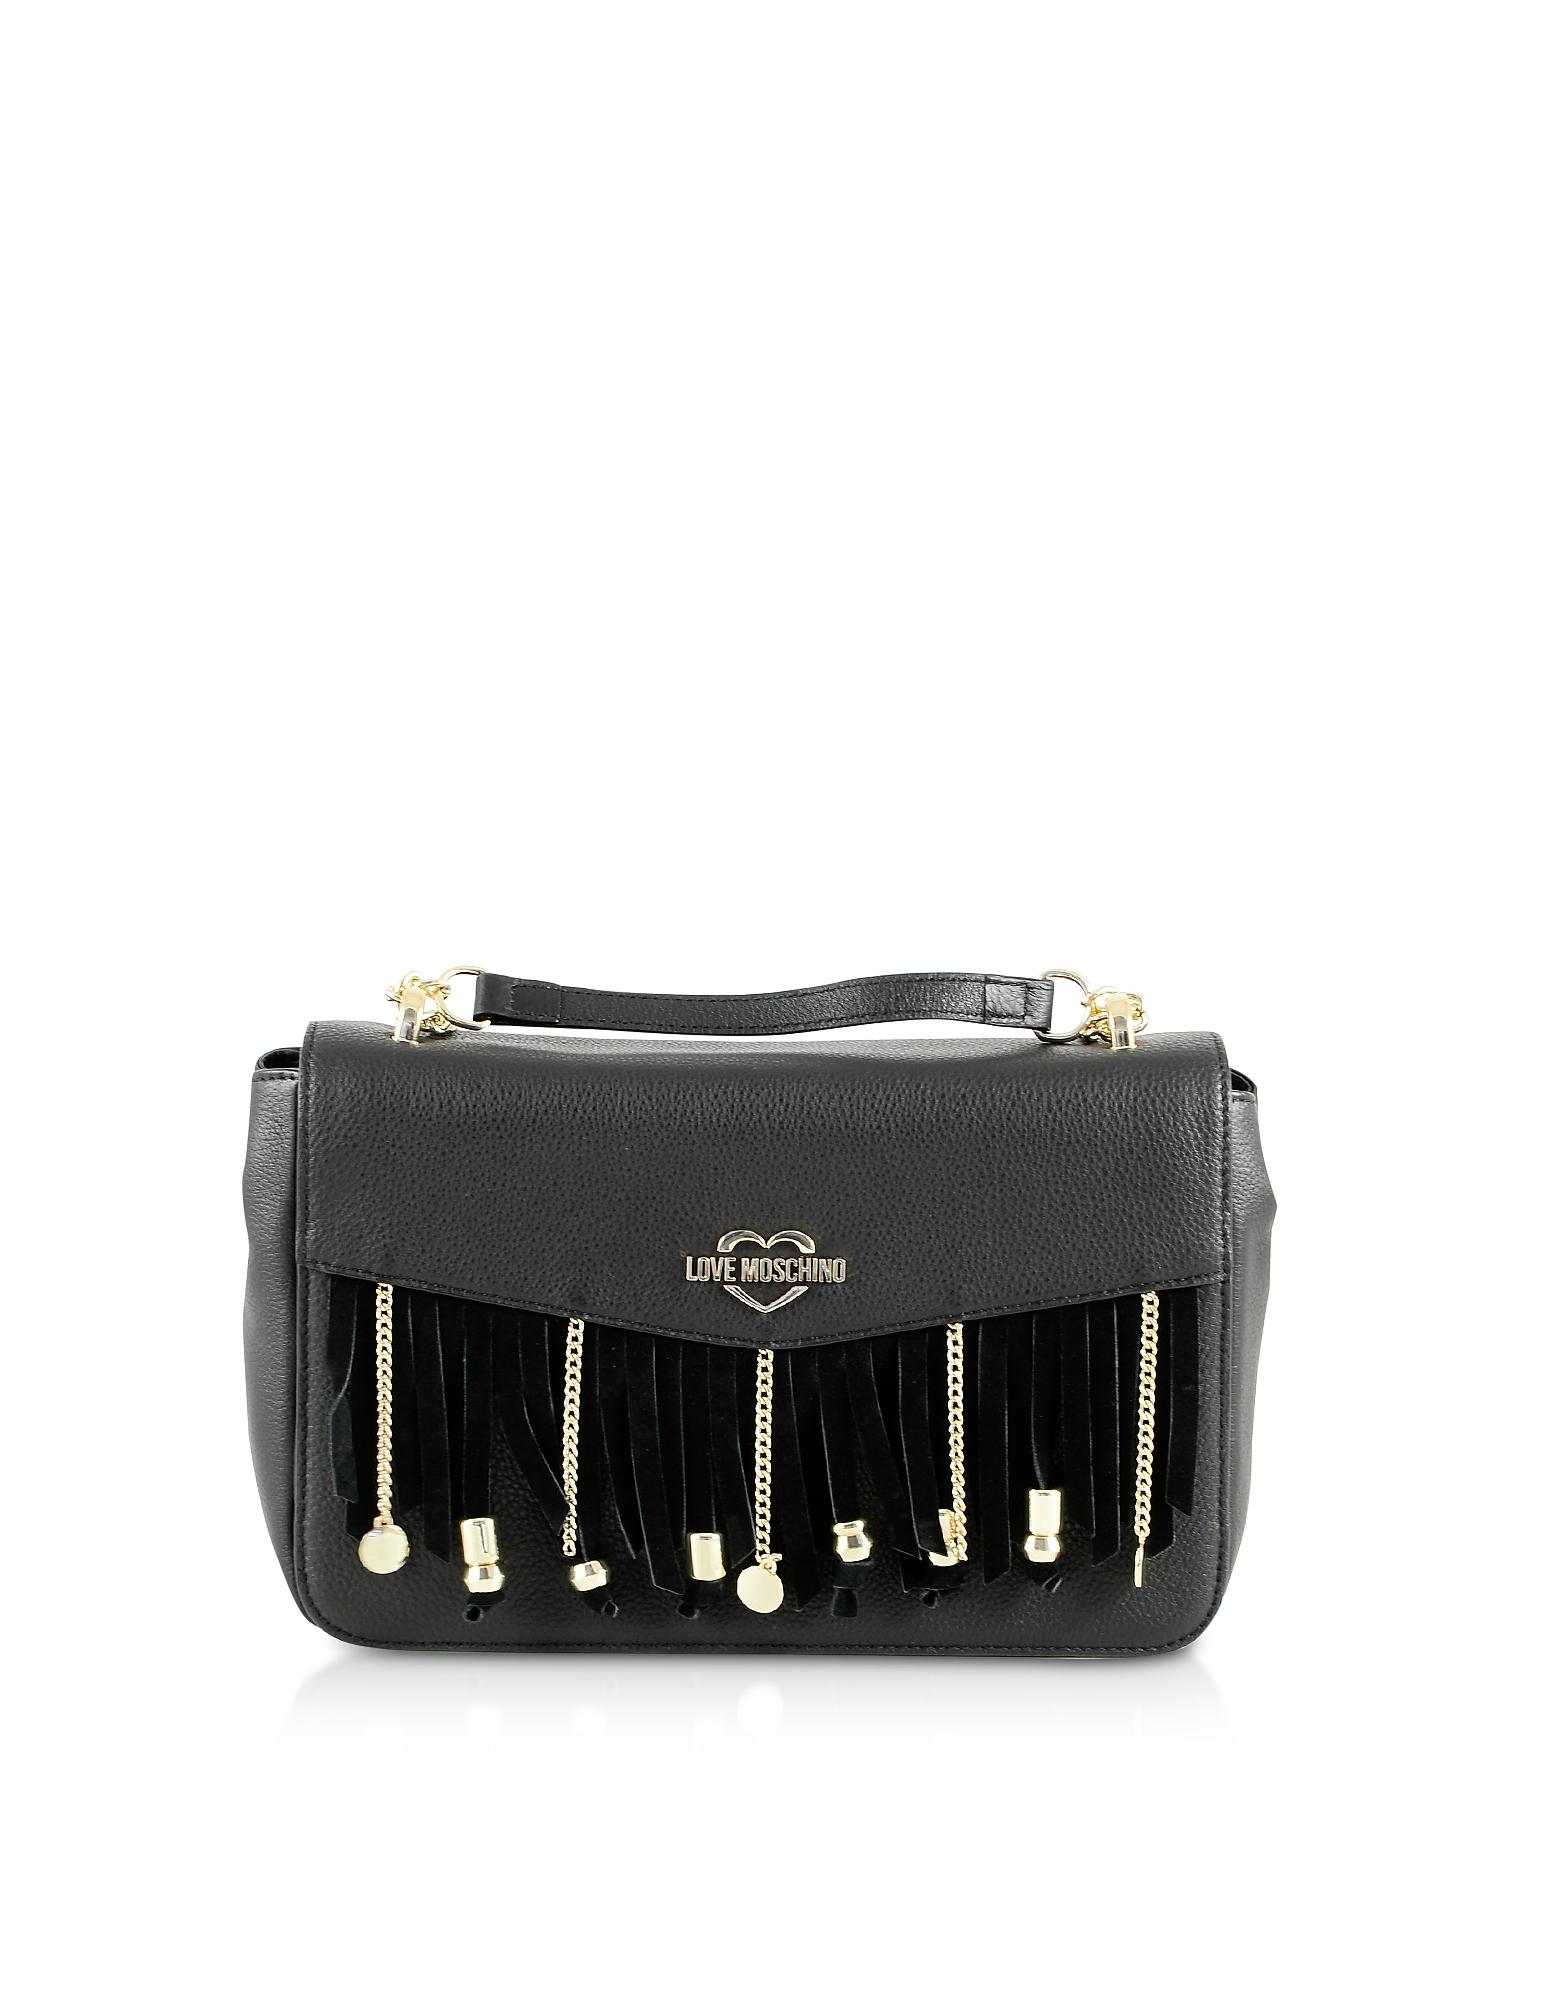 Love Moschino Designer Handbags, Chain and Charms Black Eco-Leather Top-Handle Bag